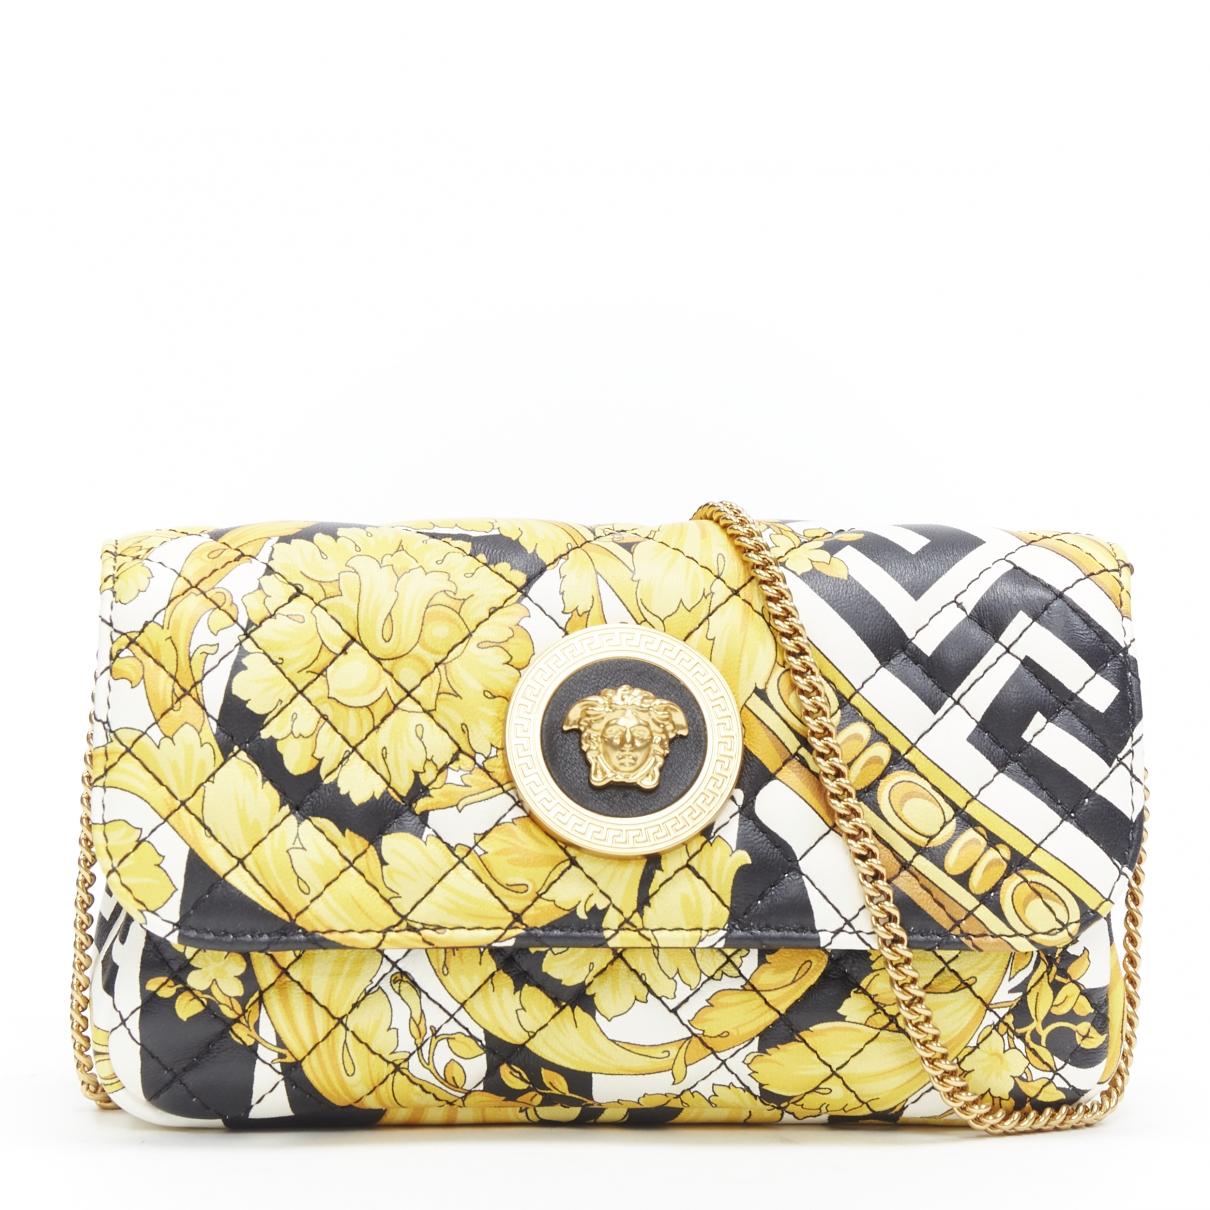 Versace \N Multicolour Leather handbag for Women \N